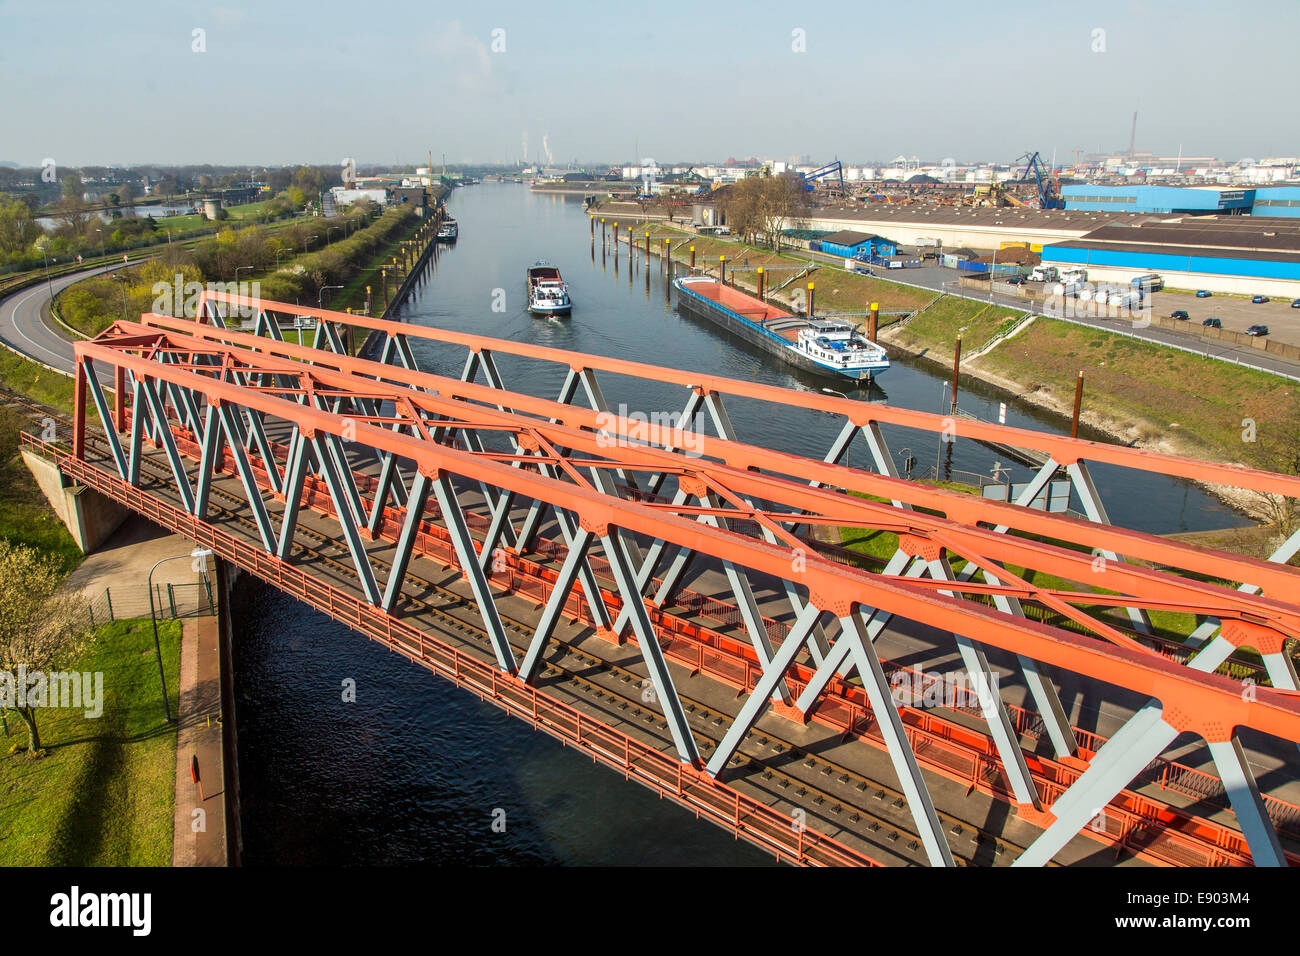 Europe's largest inland port, Duisburg Ruhrort, cargo ship runs into the lock Meidrich, - Stock Image